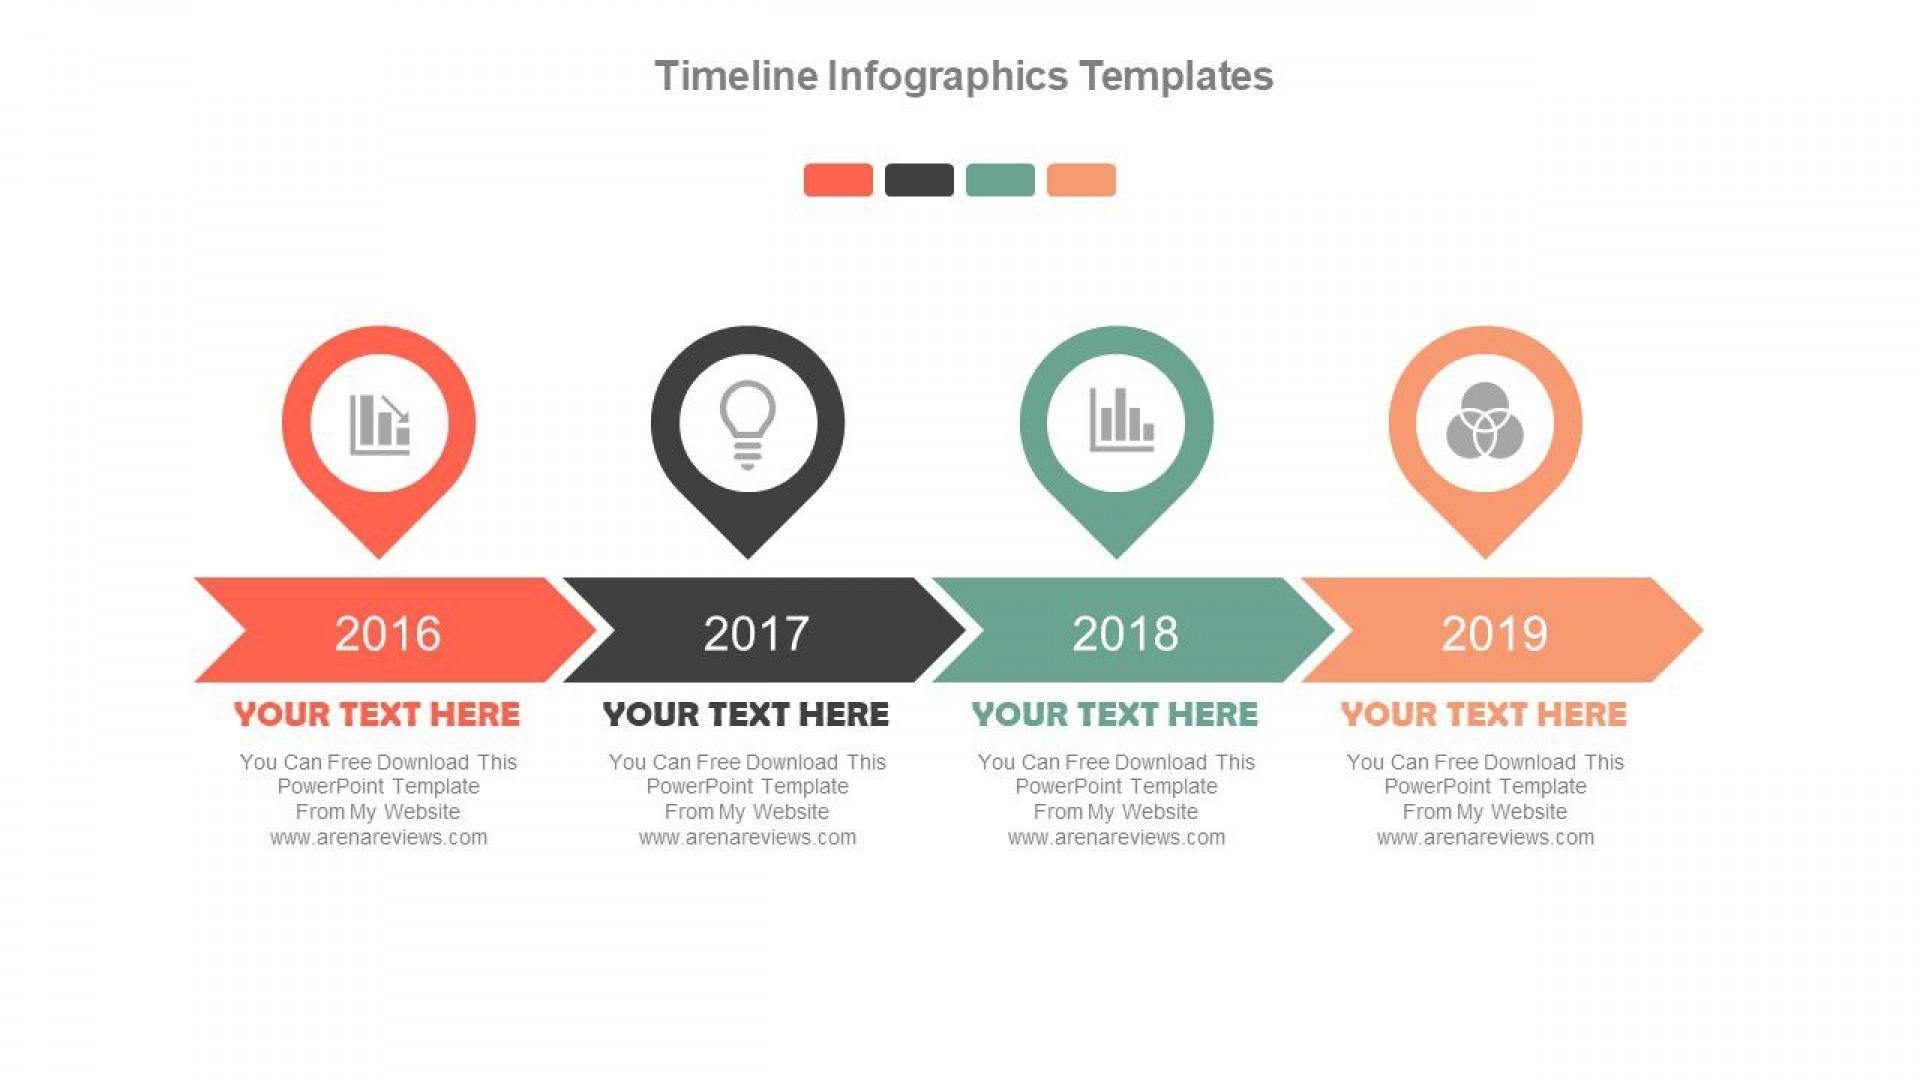 004 Magnificent Timeline Presentation Template Free Download Idea 1920